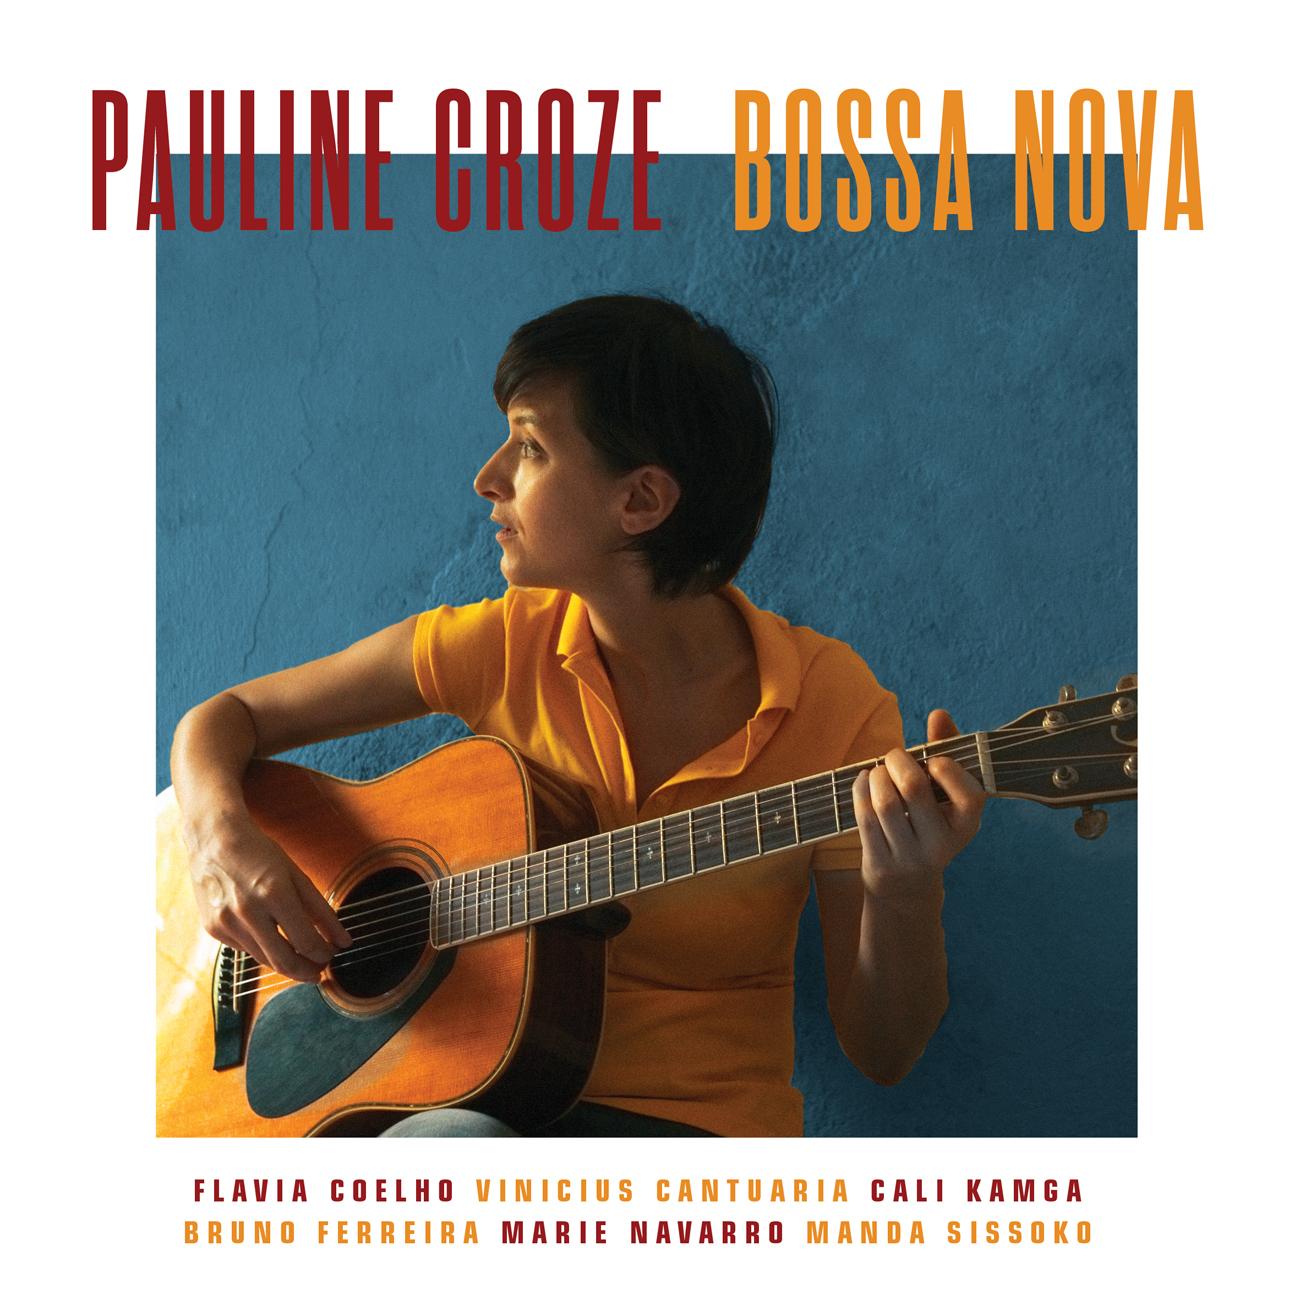 FRONT Pauline Croze - Bossa Nova2